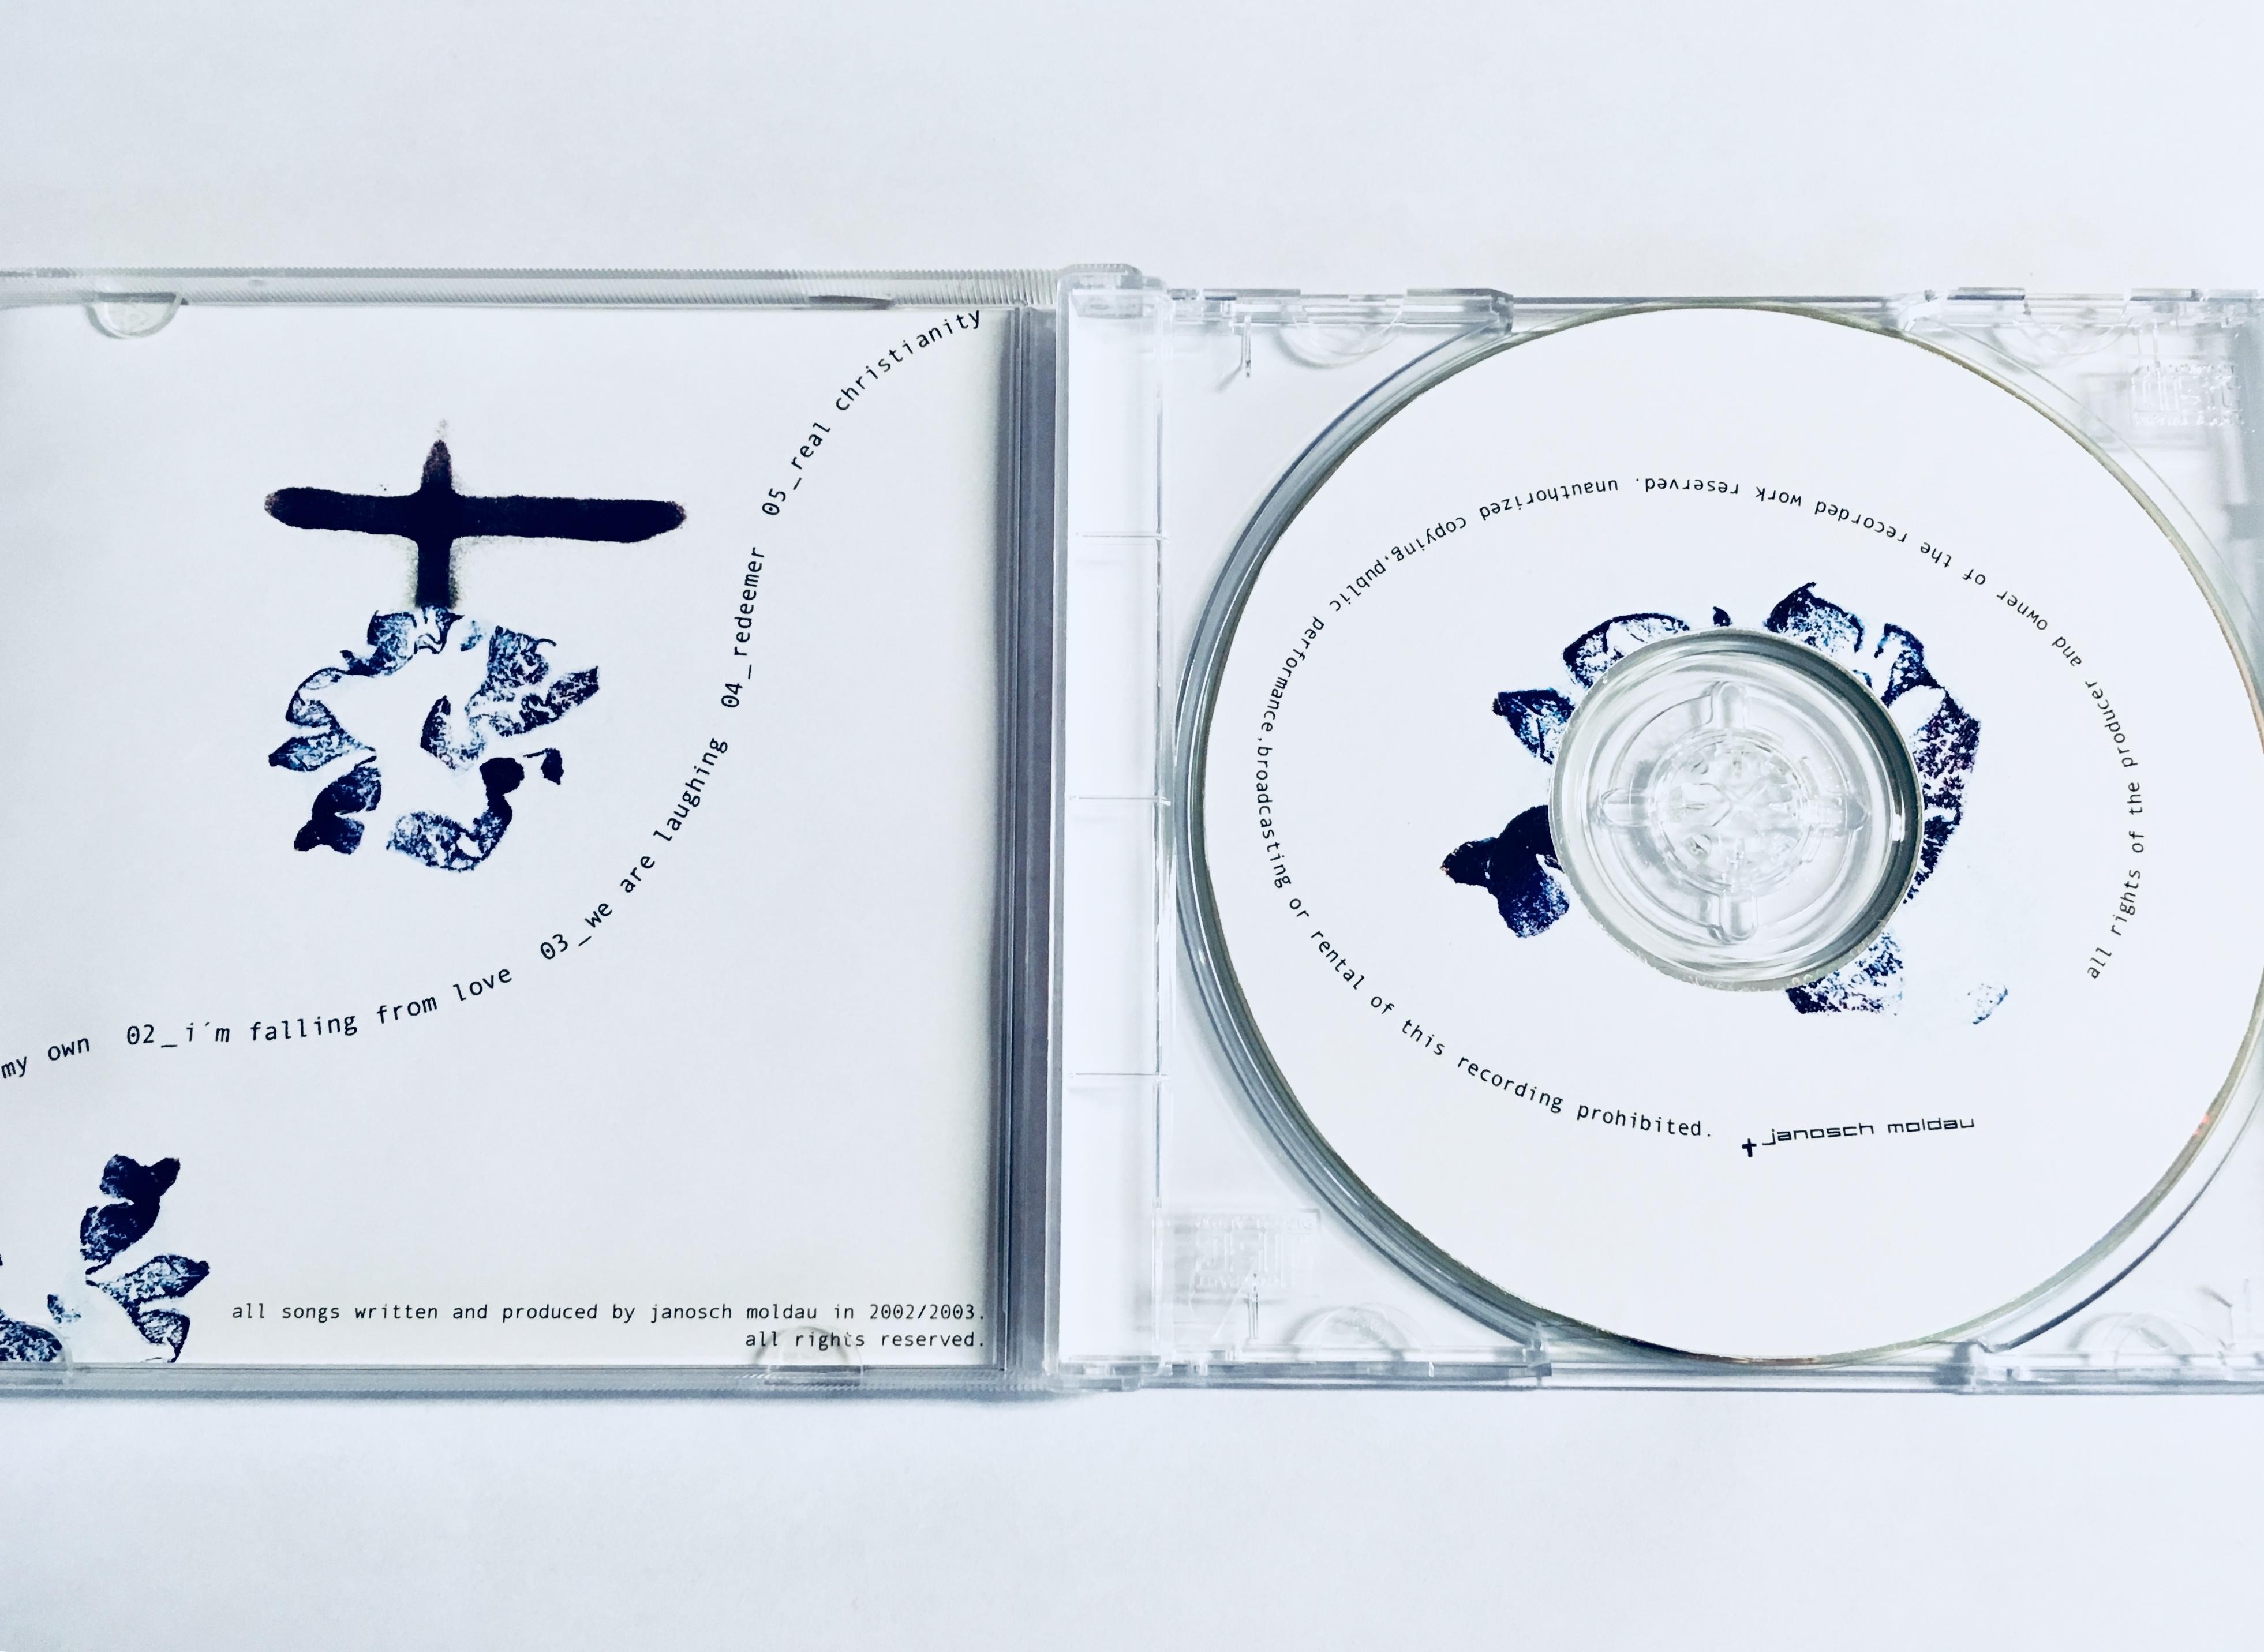 janosch moldau 1st promo cd